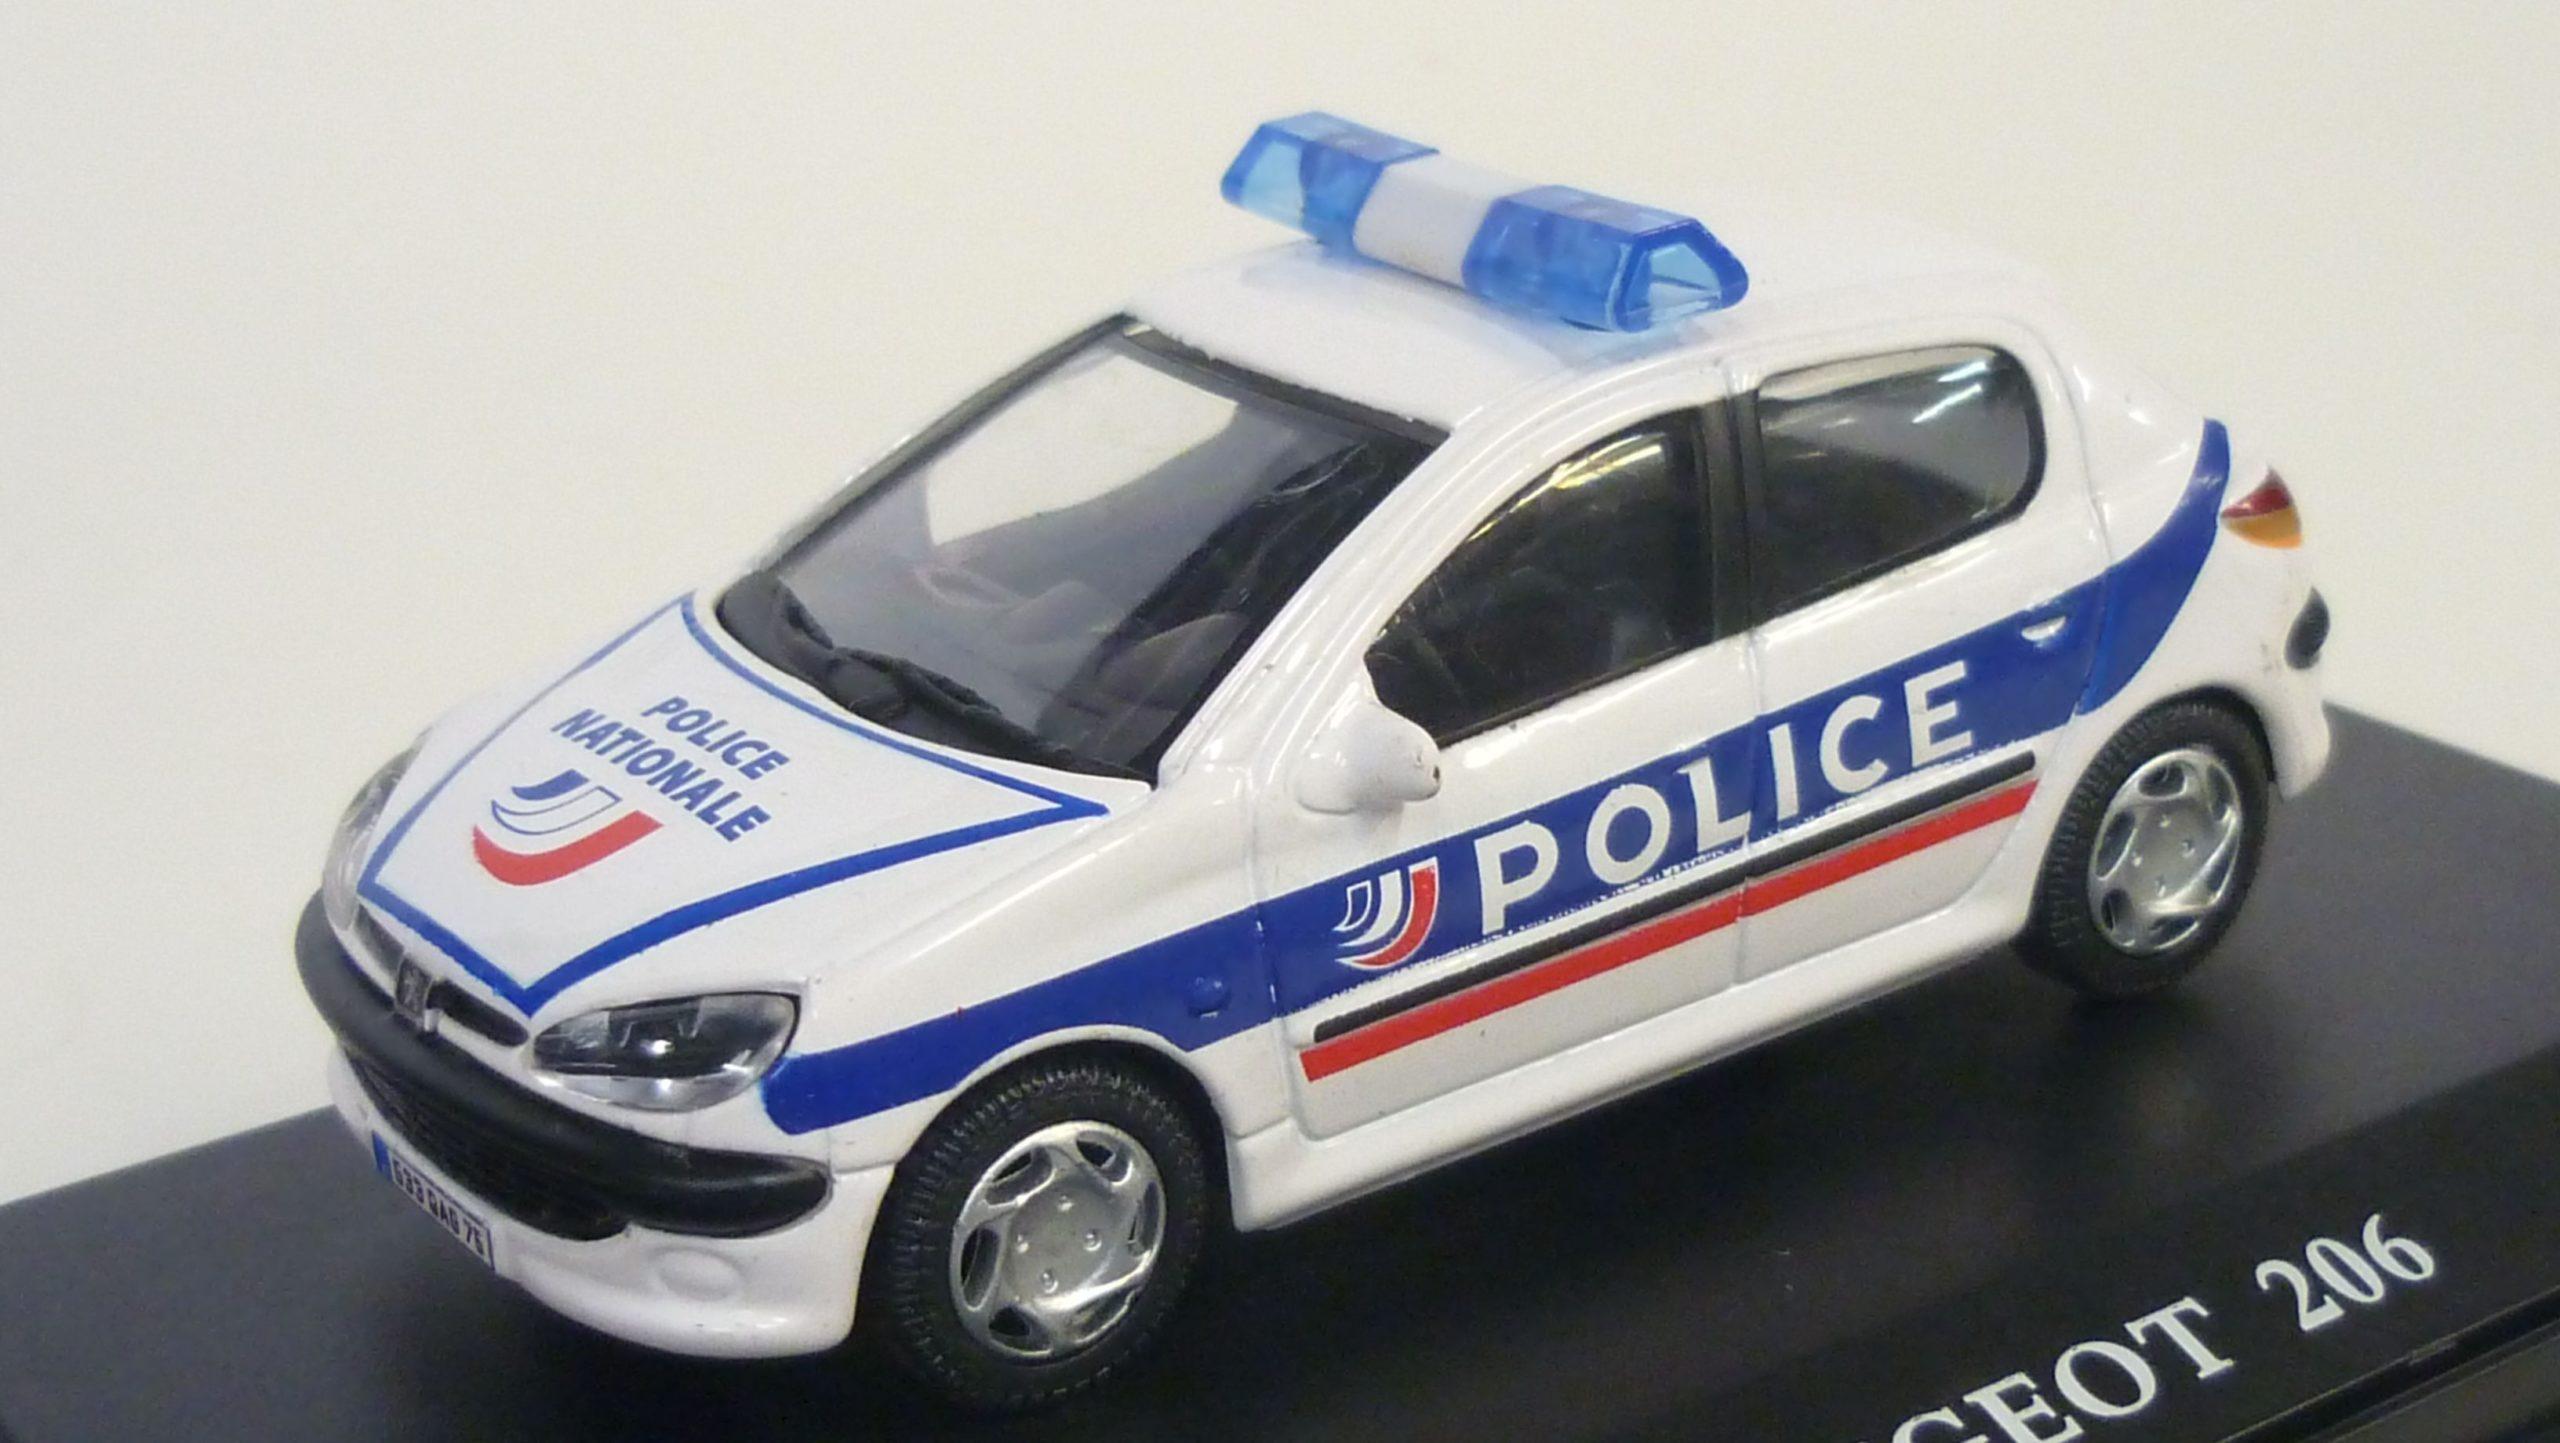 politie Bruxelles-ouest SOL35N Voiture 1//43 NOREV PEUGEOT 206 police